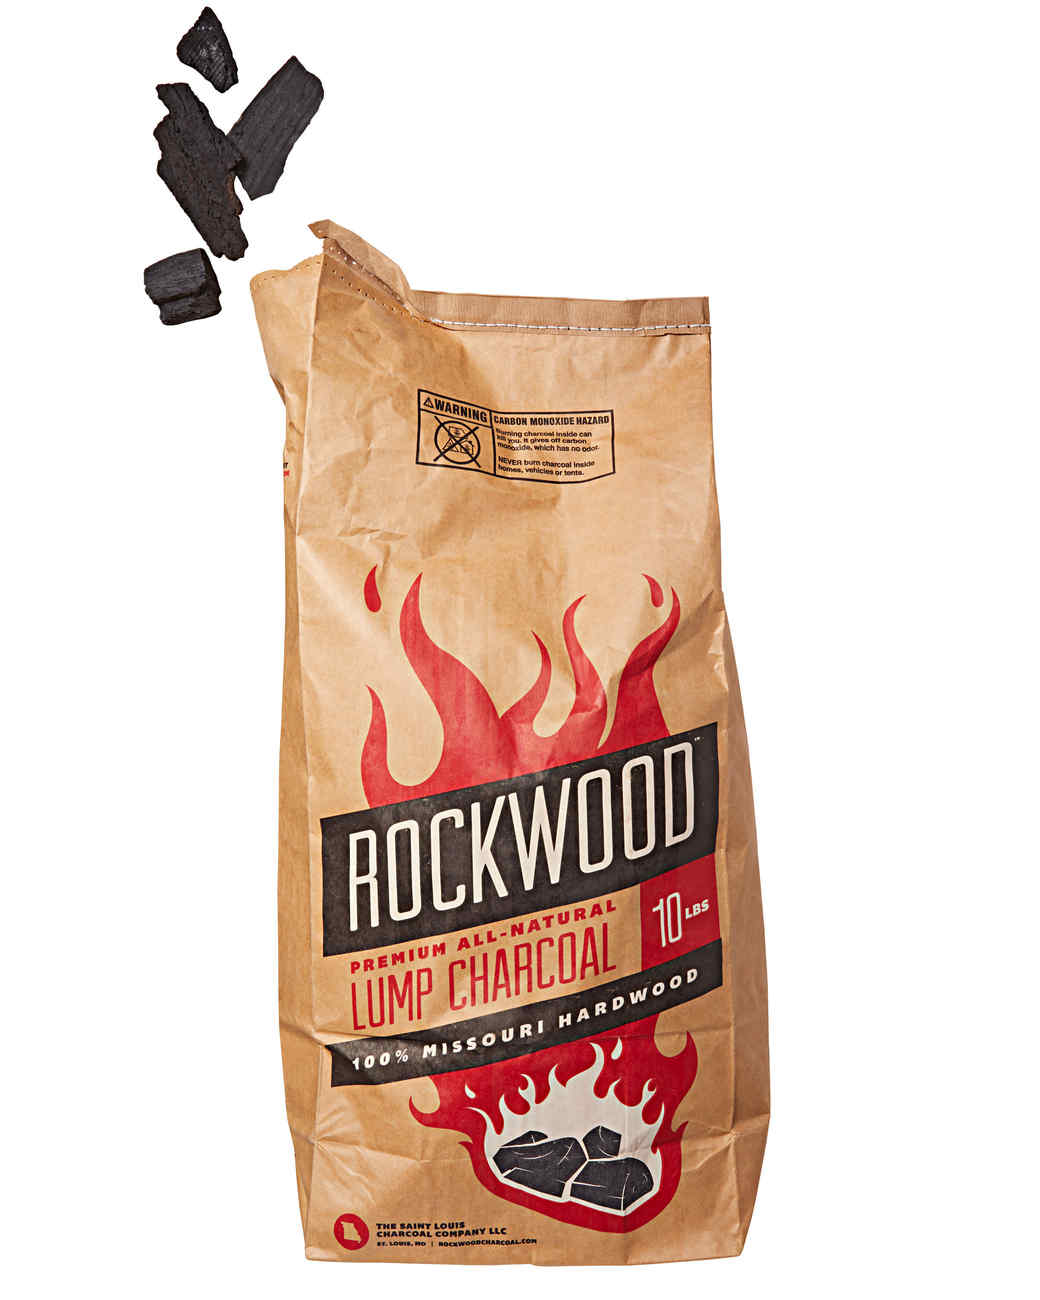 lump charcoal rockwood